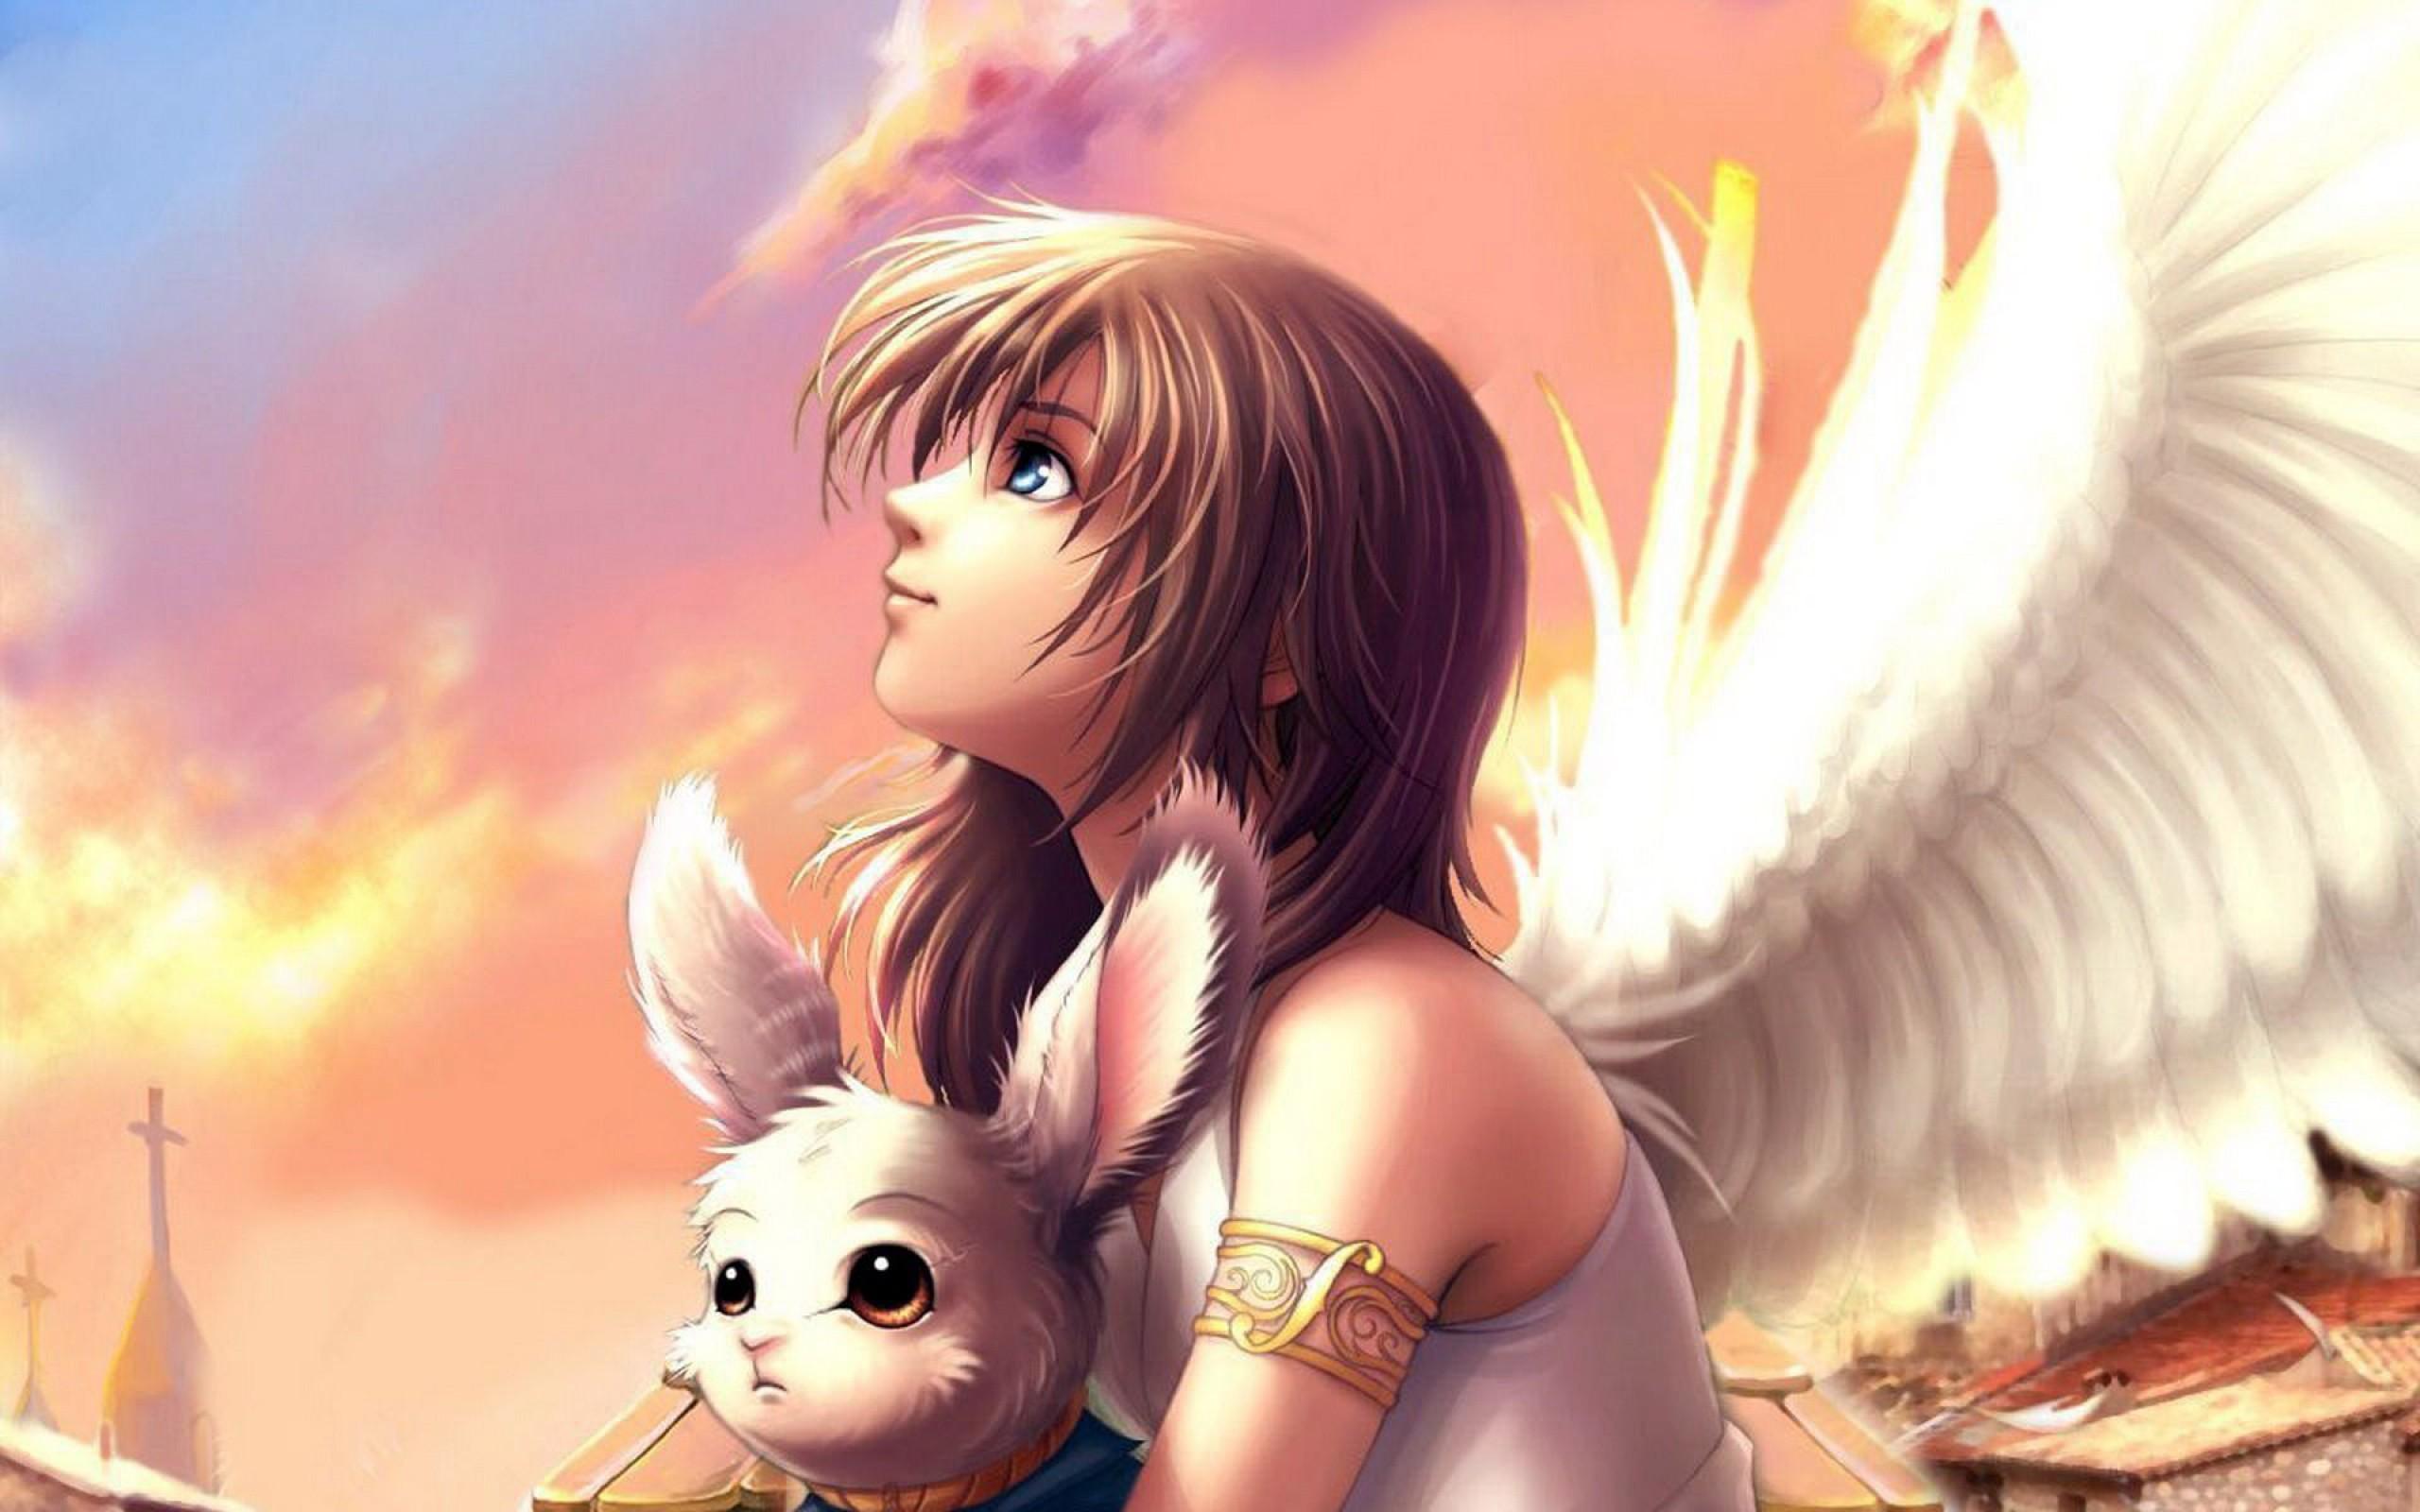 Anime angel wings wallpaper free desktop | Wallpapers, Backgrounds .